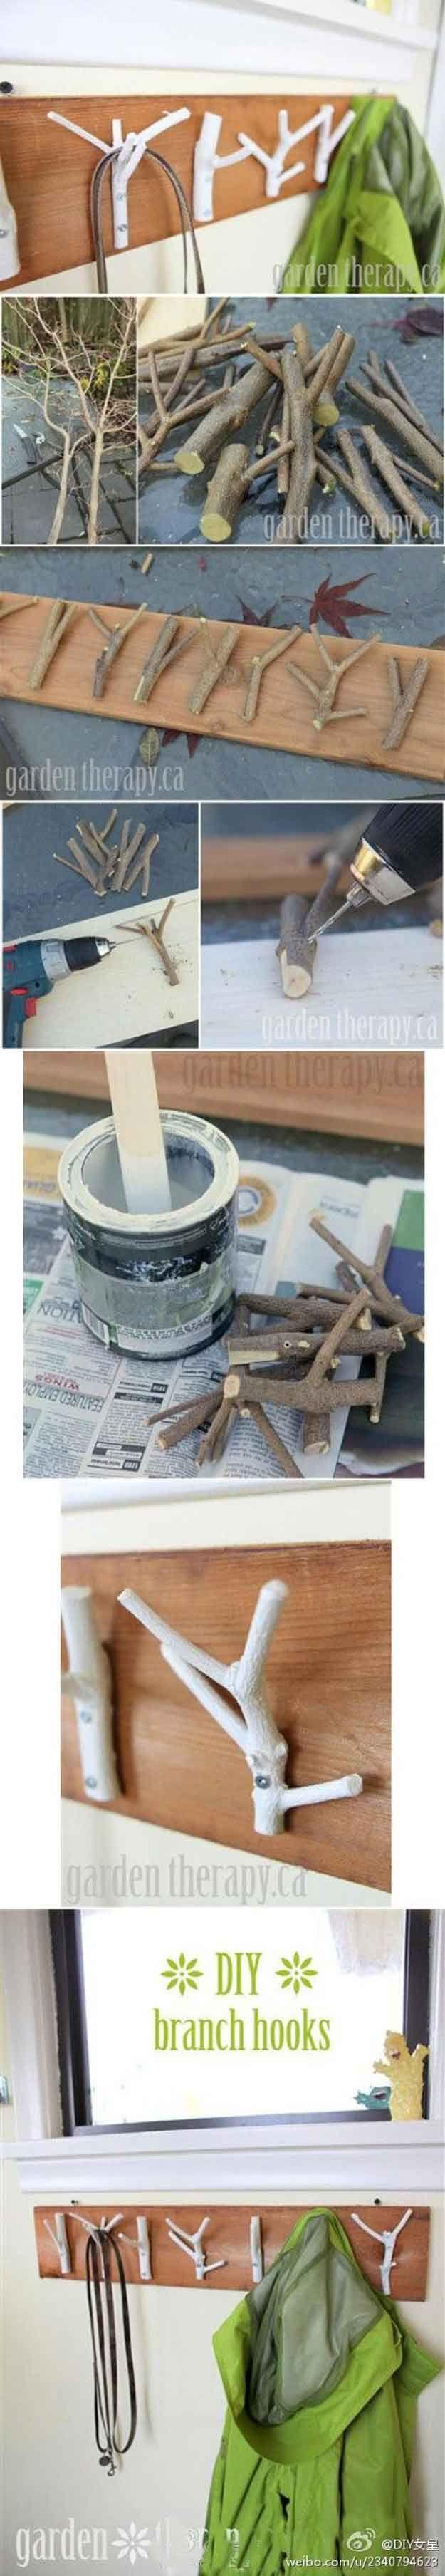 Cheap DIY Projects for Teenage Boys Bedroom Decor | Fallen Branch Coat Rack by DIY Ready at diyready.com/...